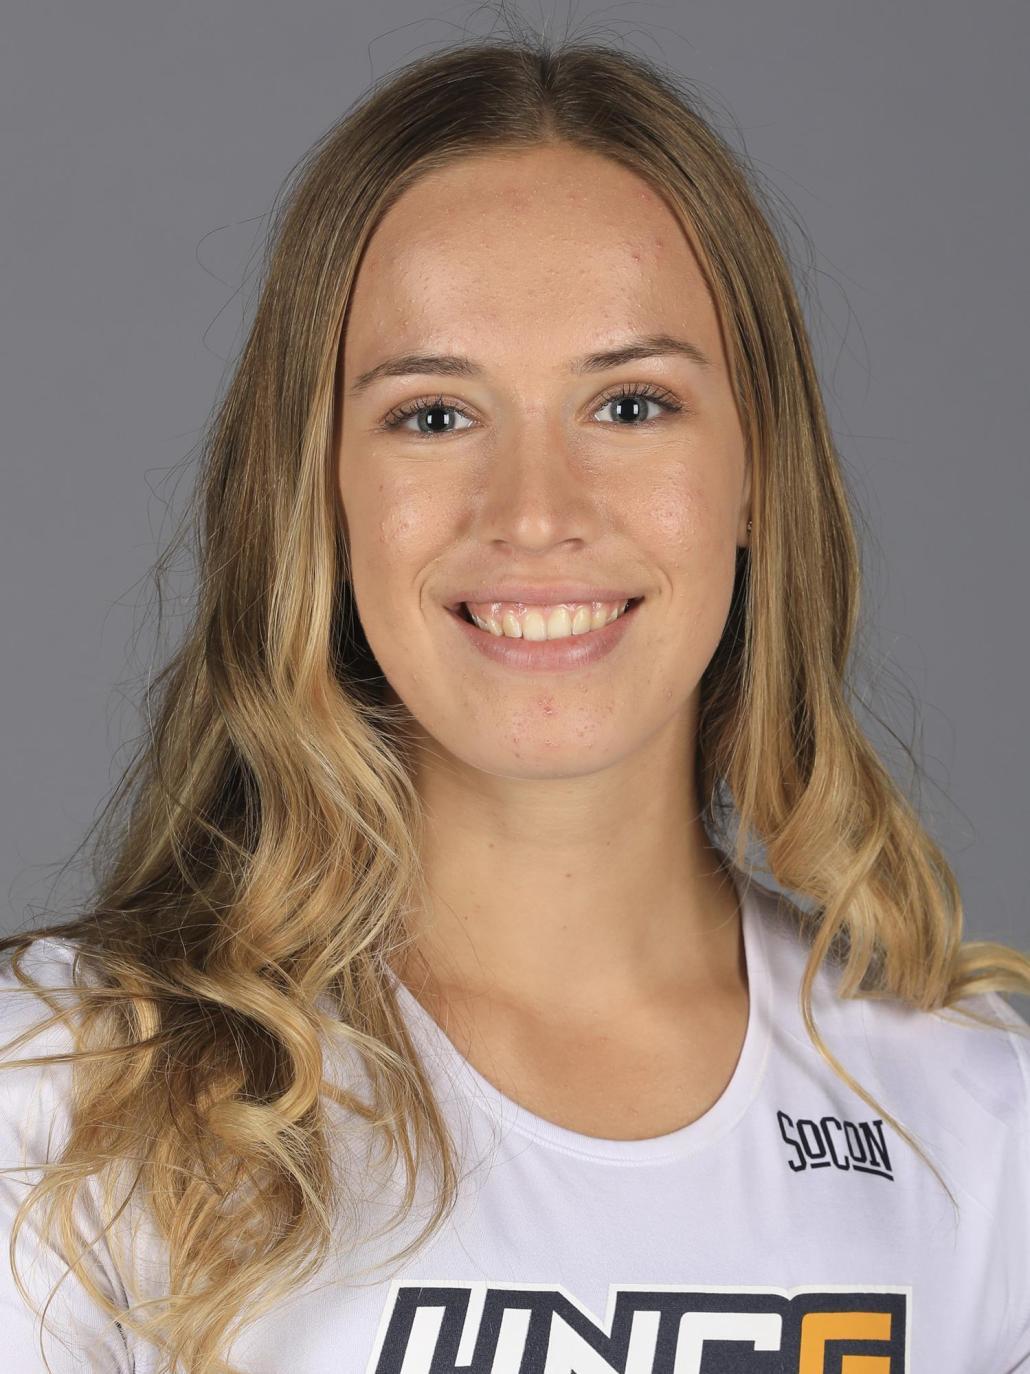 Hannah Knier